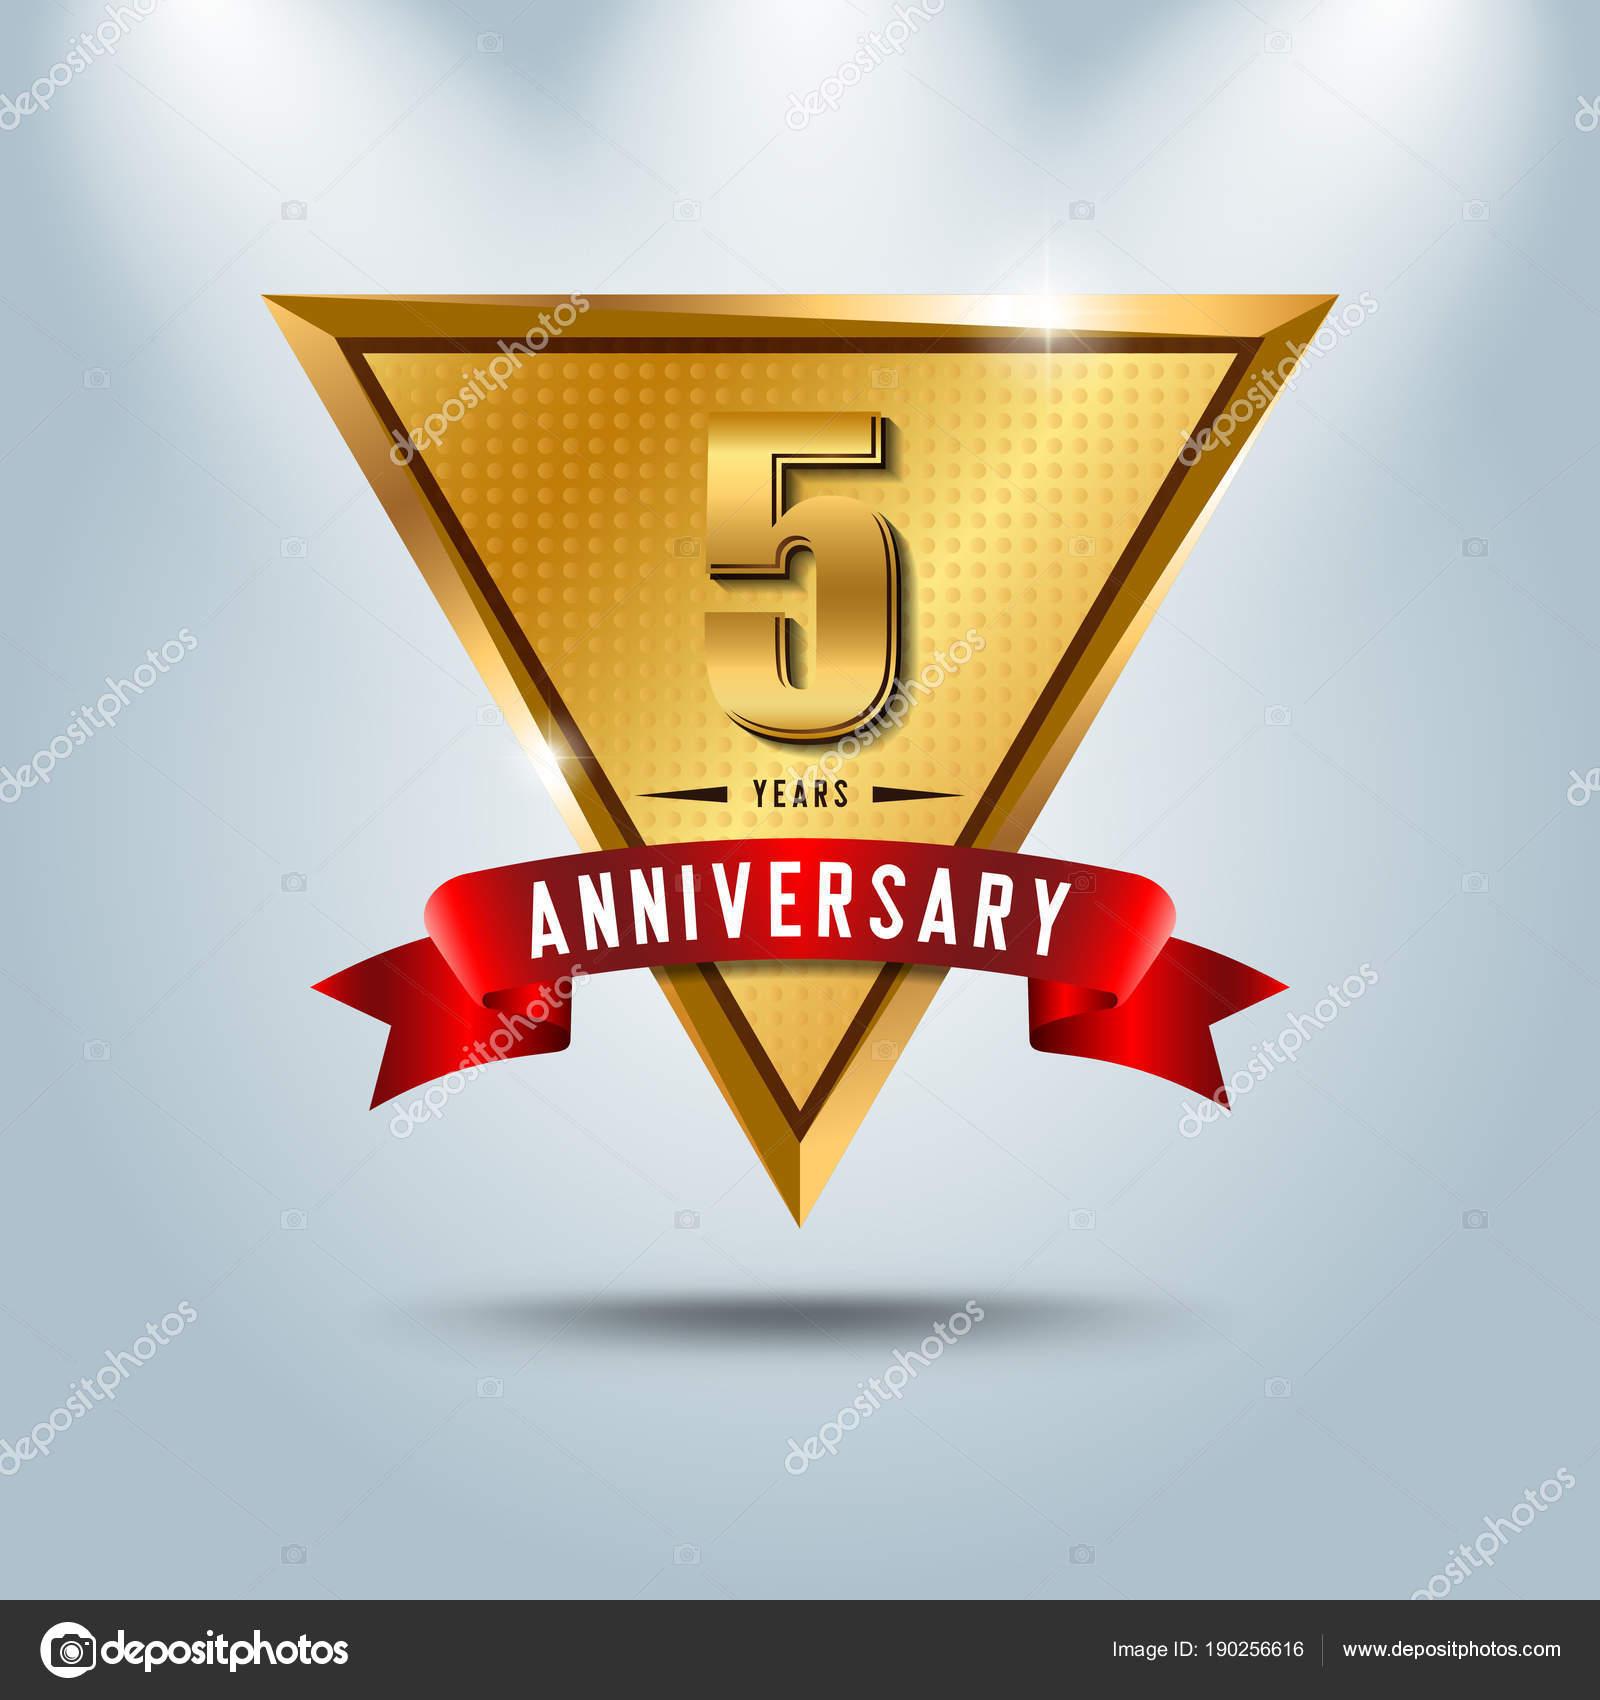 5 Years Anniversary Celebration Logotype Golden Anniversary Emblem